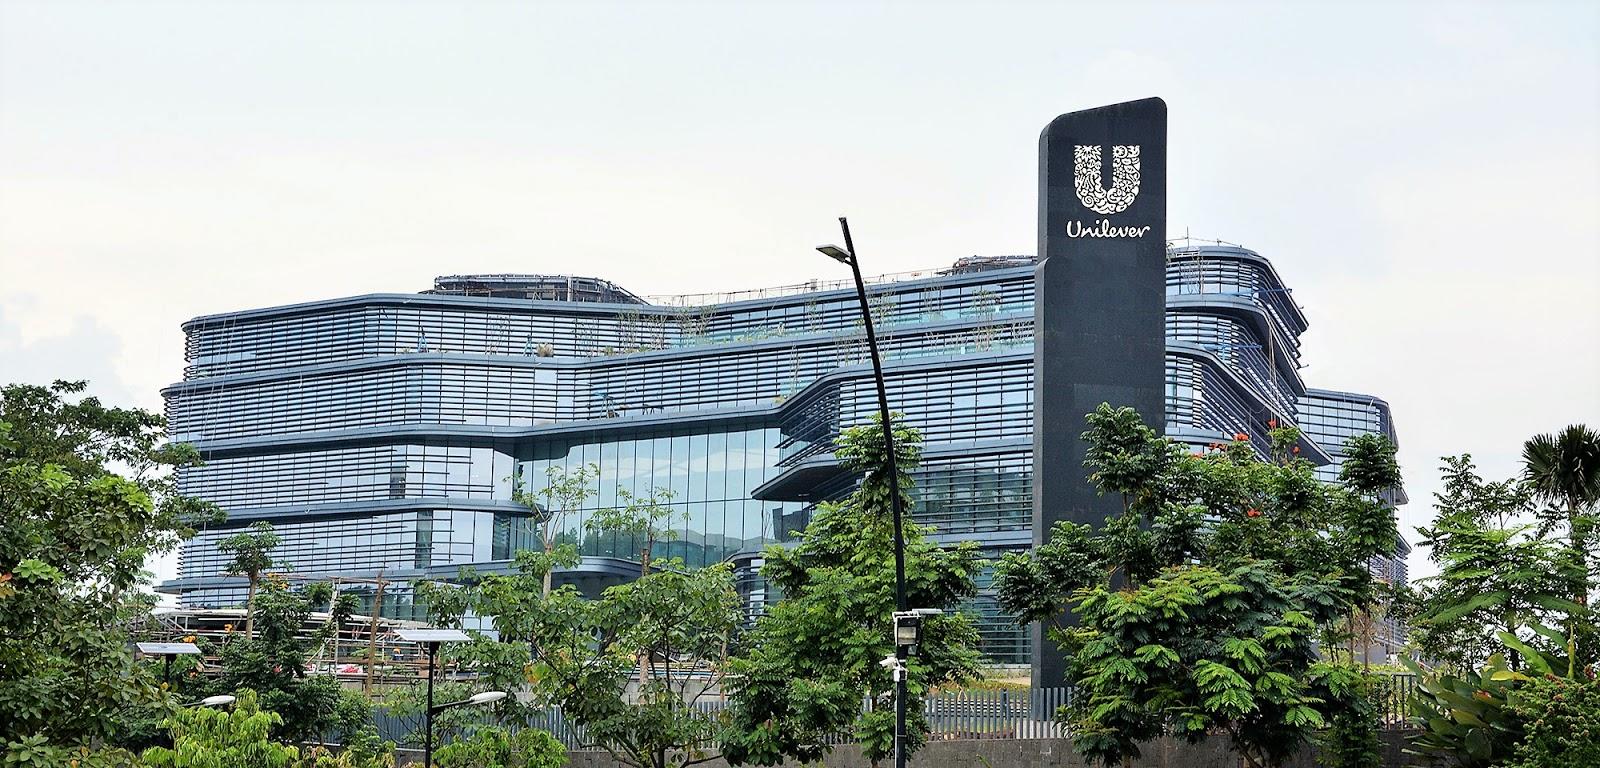 Lowongan Kerja Pabrik Kawasan Jababeka PT.Unilever Indonesia 2019